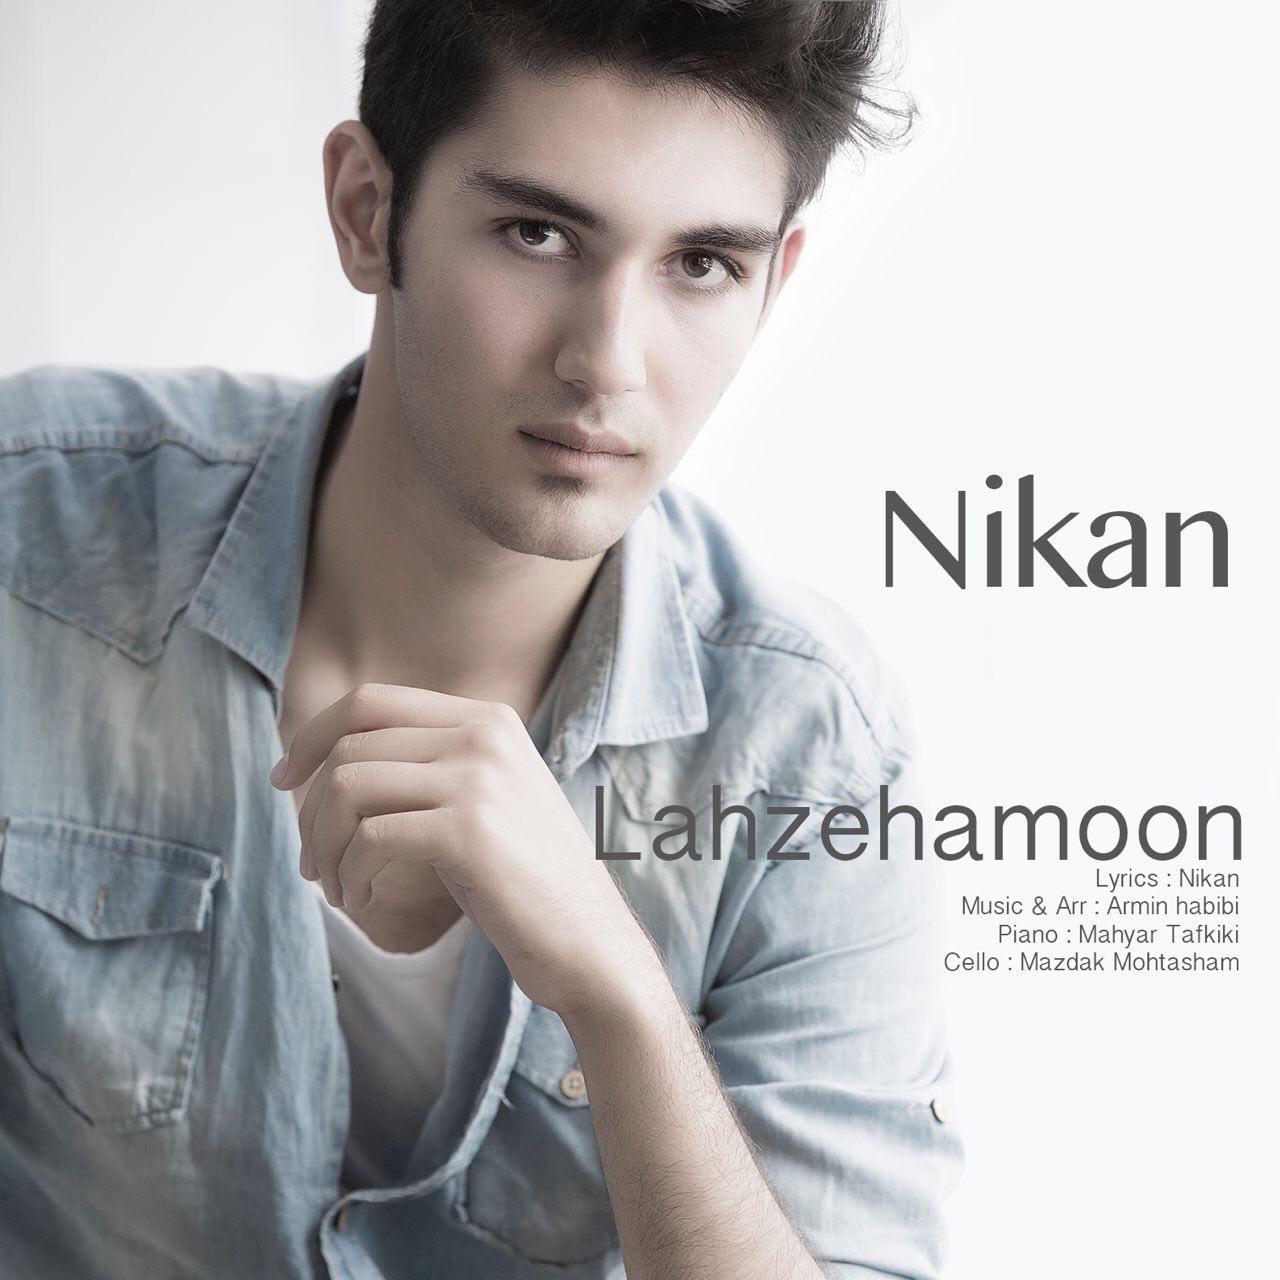 nikan-Lahzehamoon_دانلود-آهنگ-جدید-نیکان-لحظه-هامون